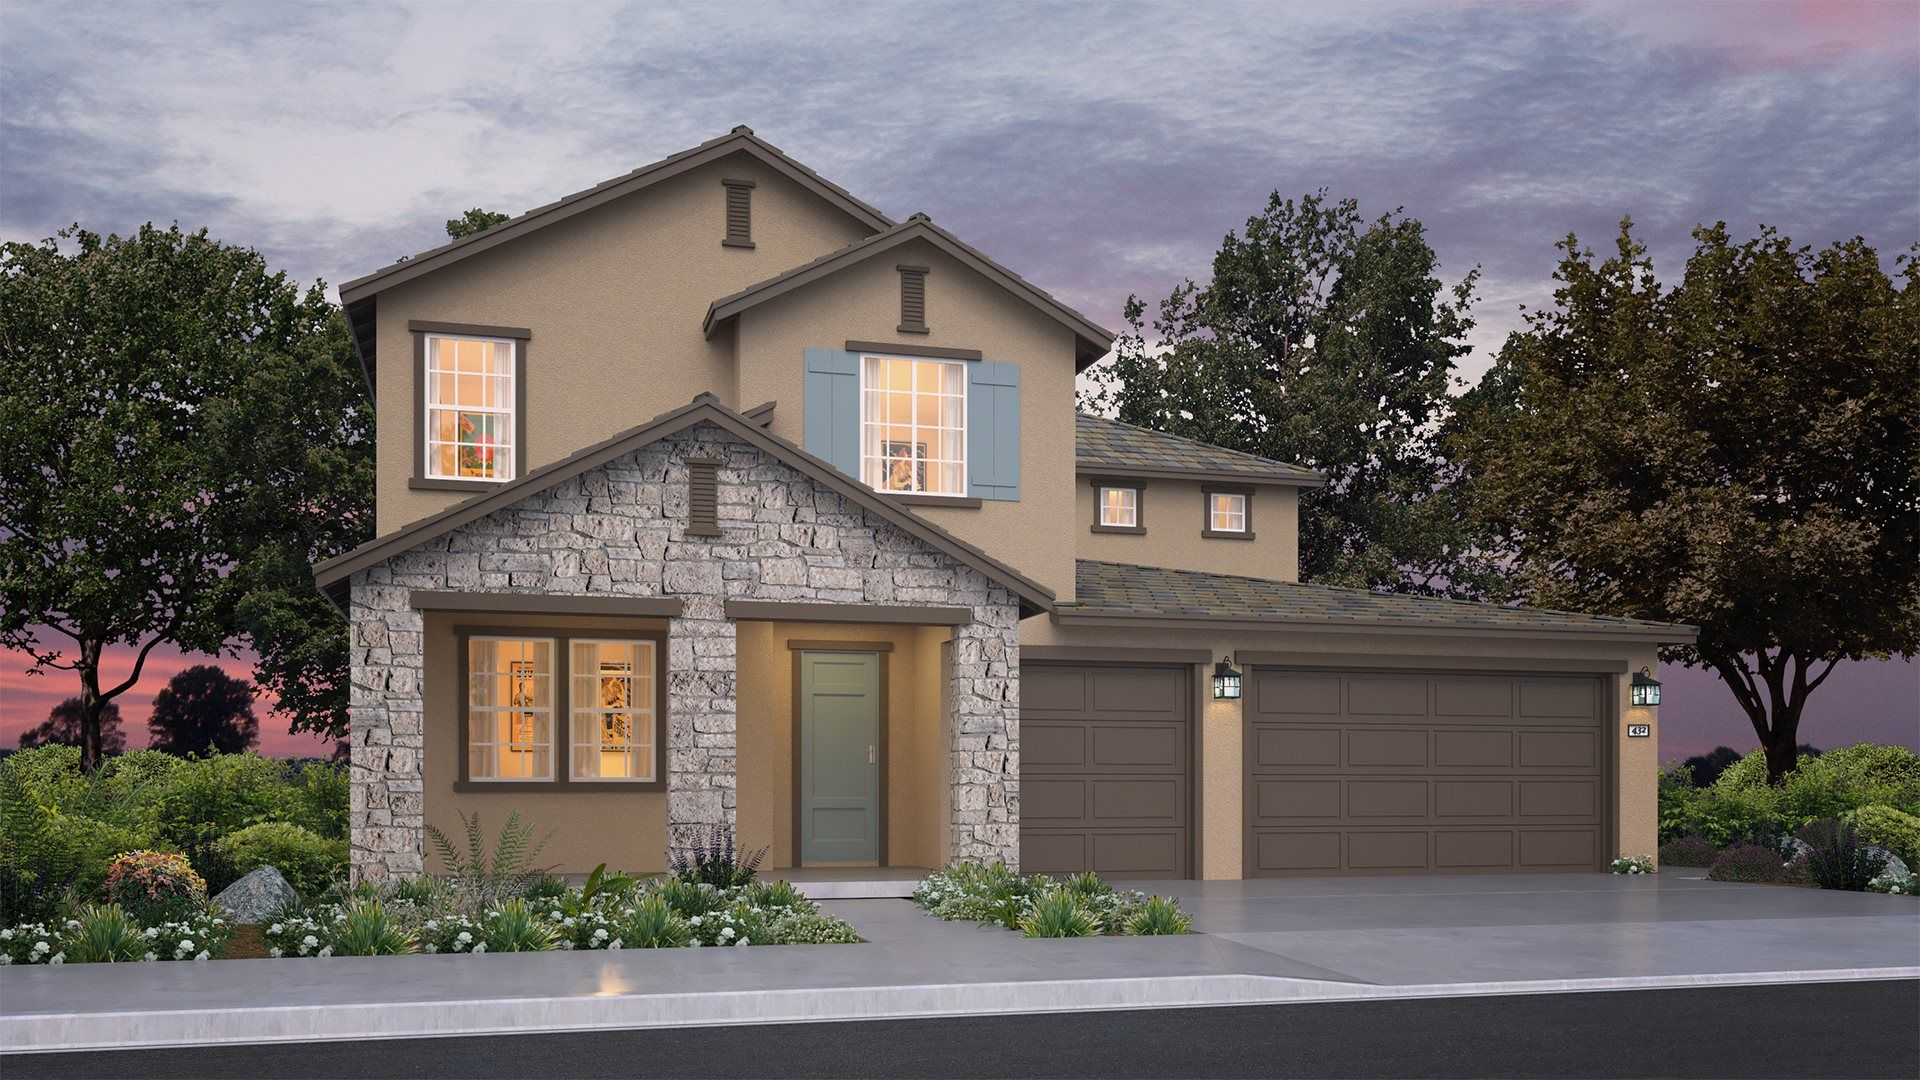 'Sierra Bella - Crescendo' by Lennar - Inland Empire in Riverside-San Bernardino